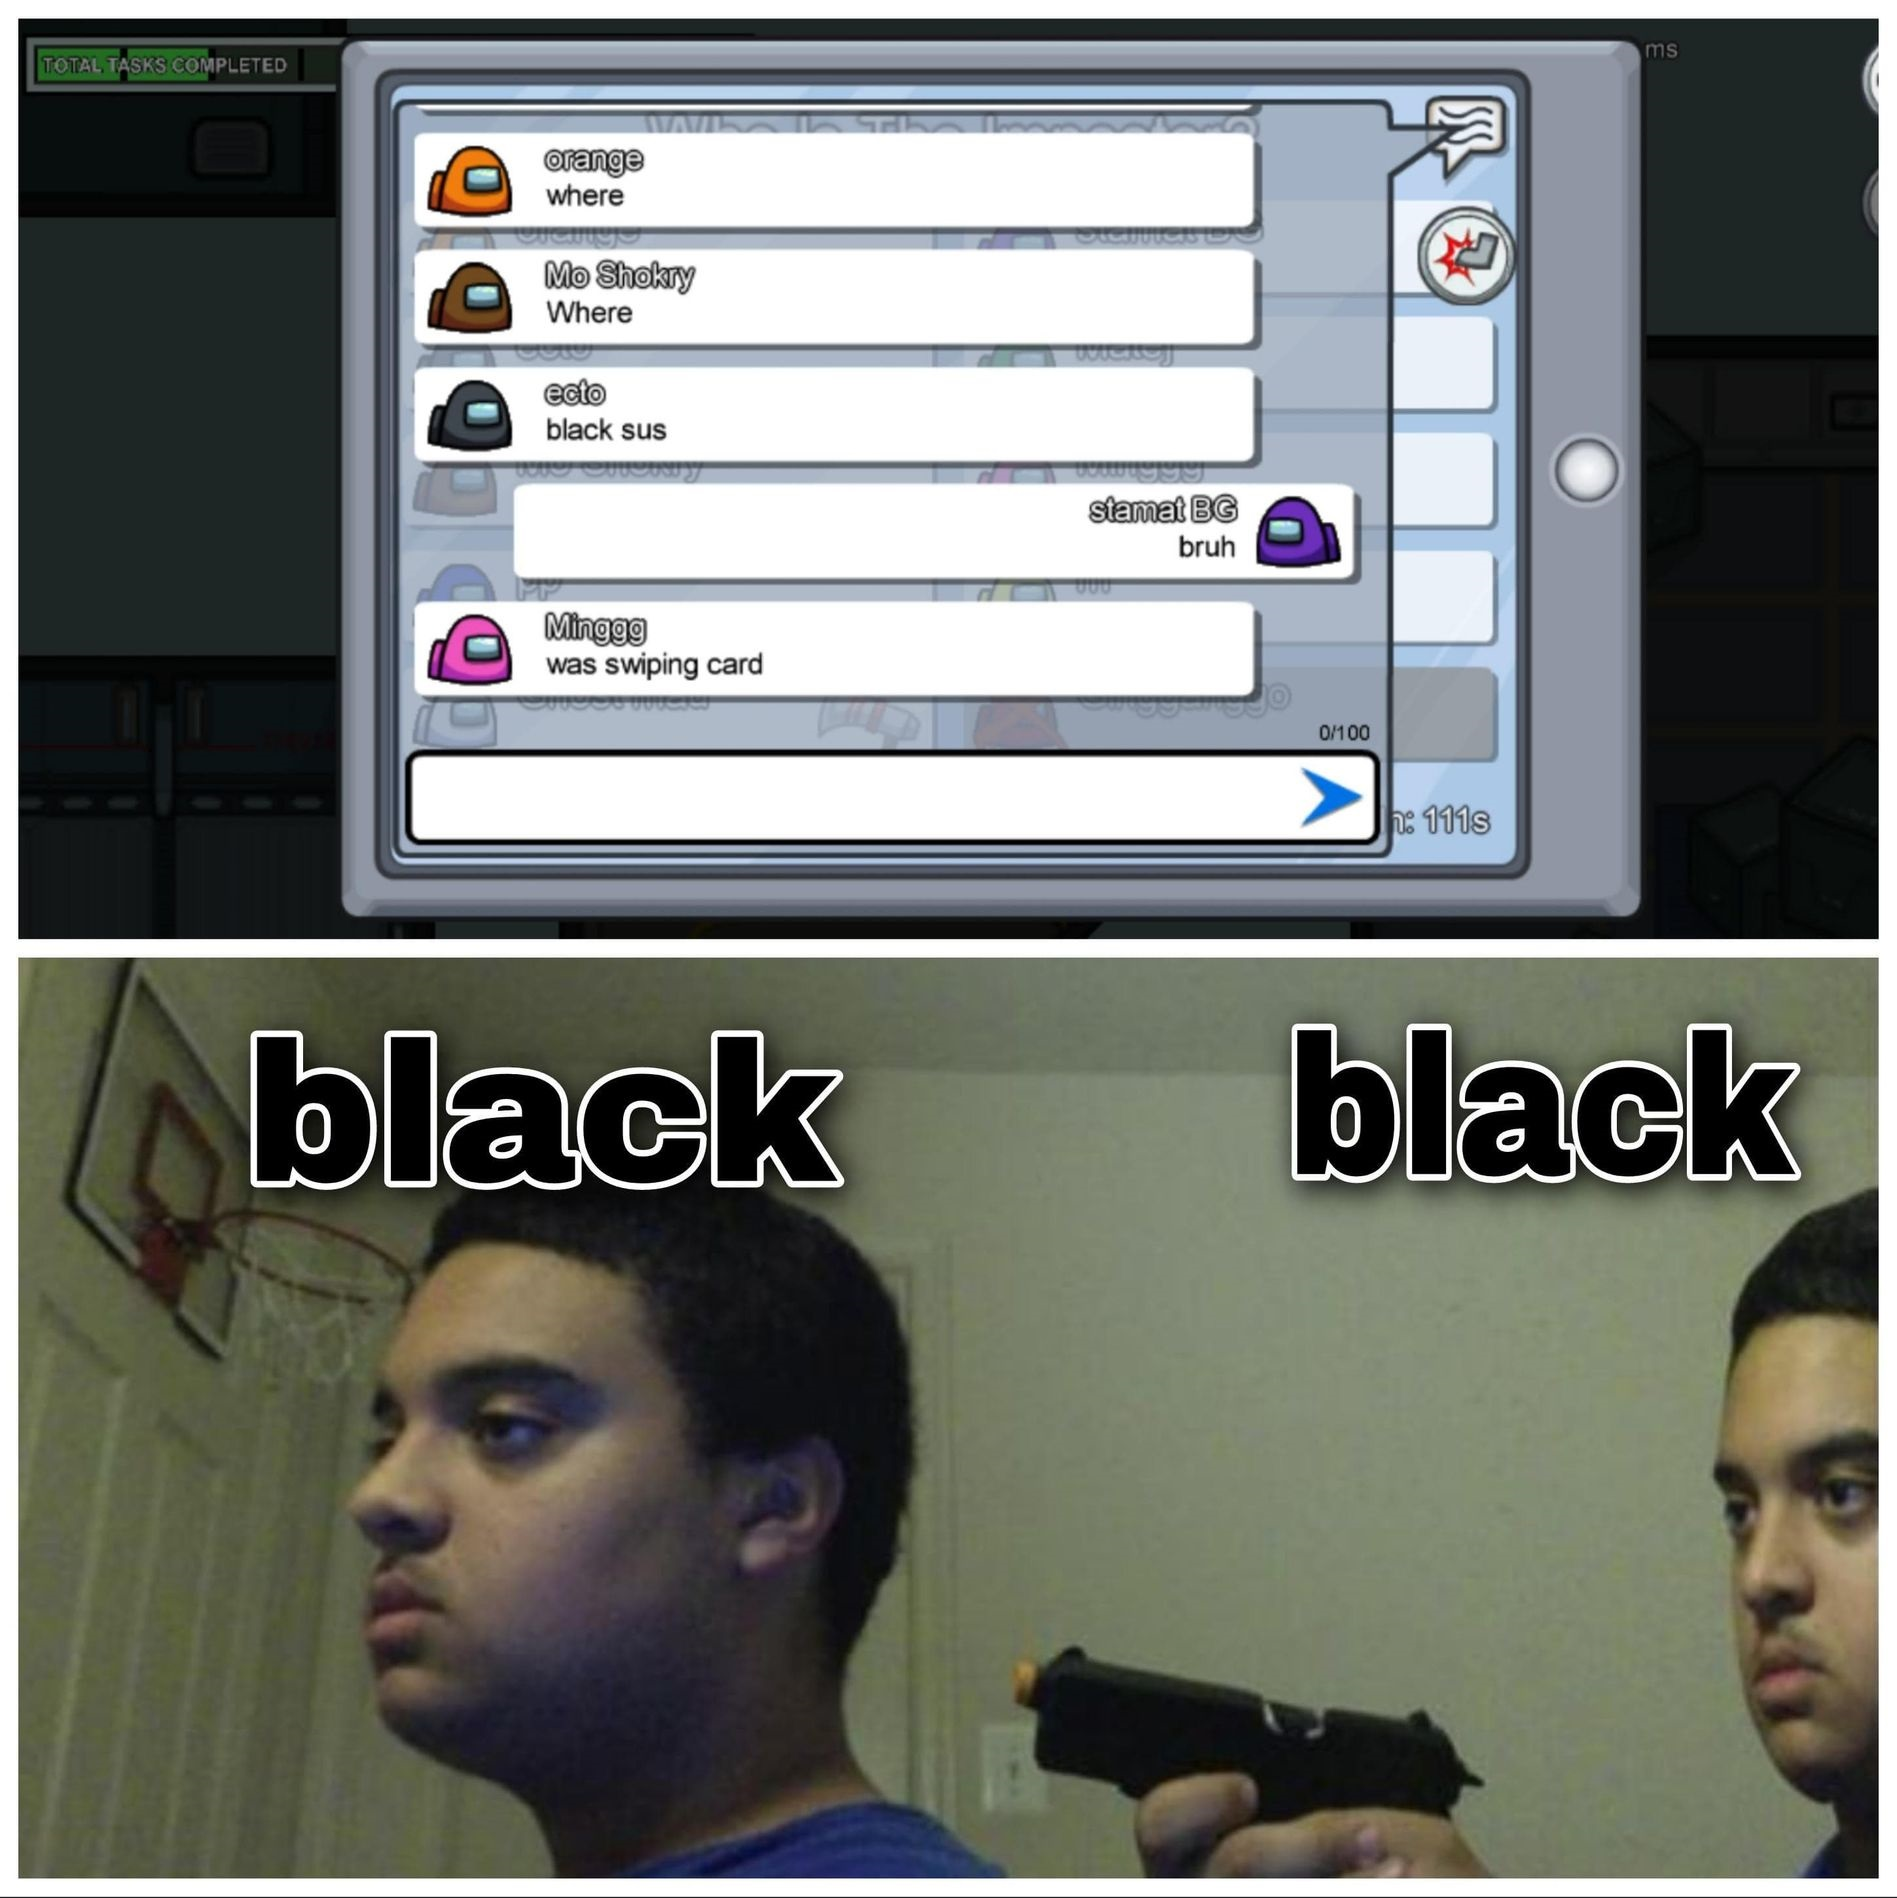 among-us-meme-black-where-black-sus-bruh - Comics And Memes